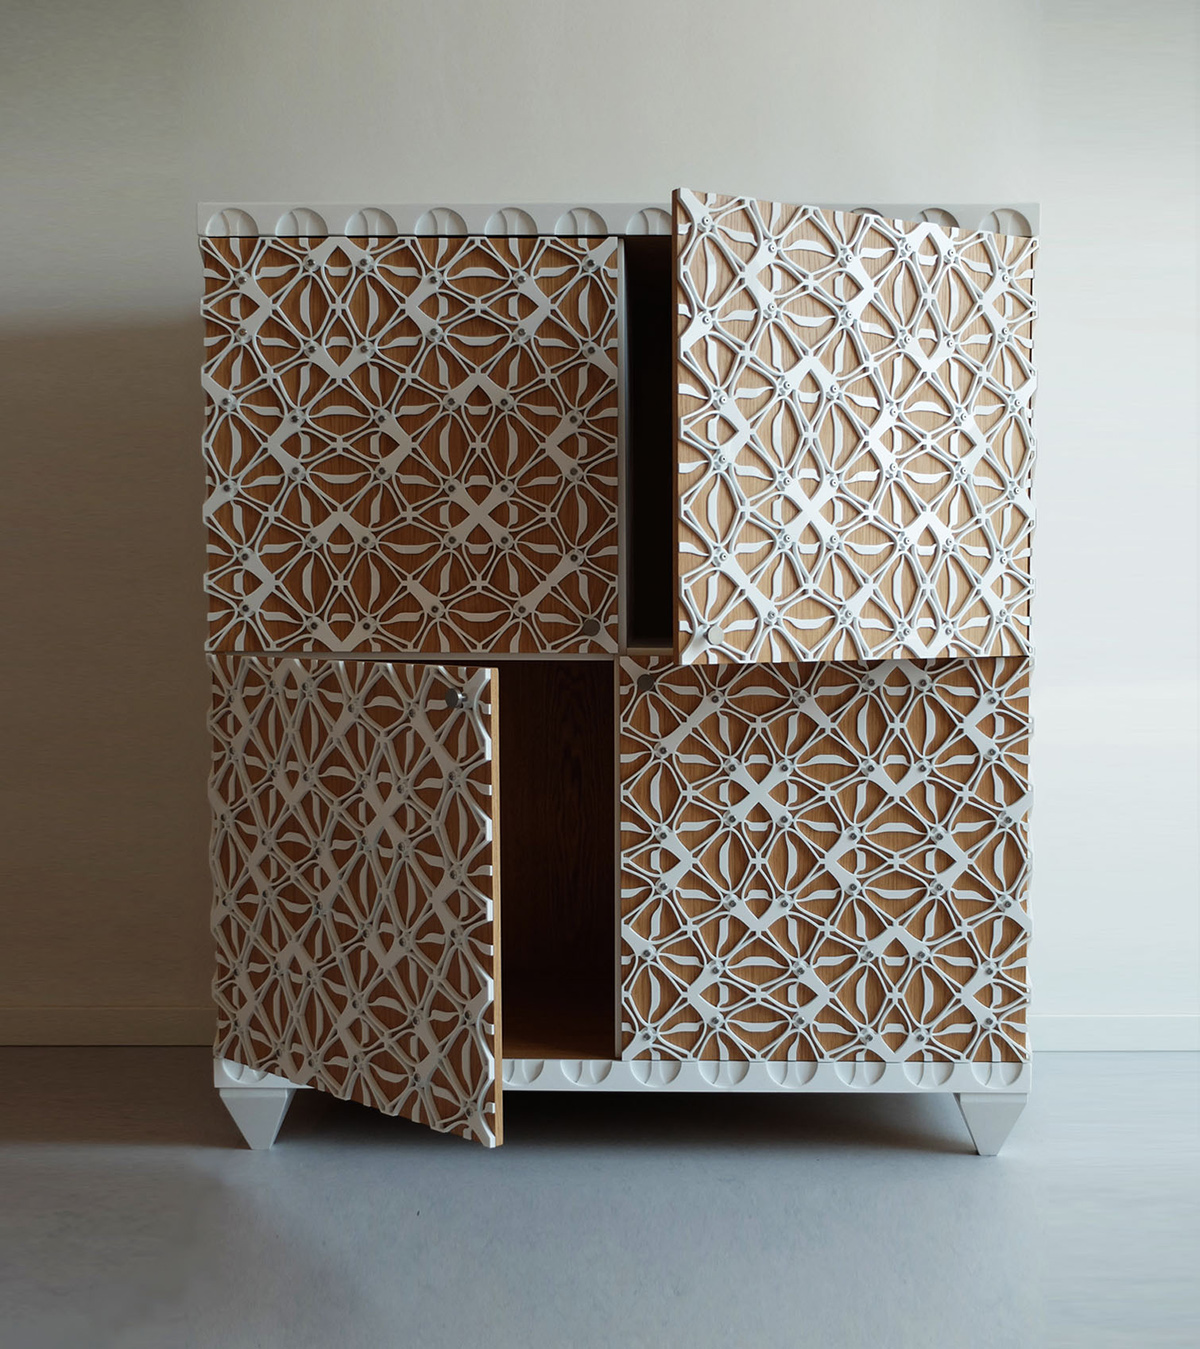 design maroc gothveil de sven hulsbergen henning design maroc. Black Bedroom Furniture Sets. Home Design Ideas